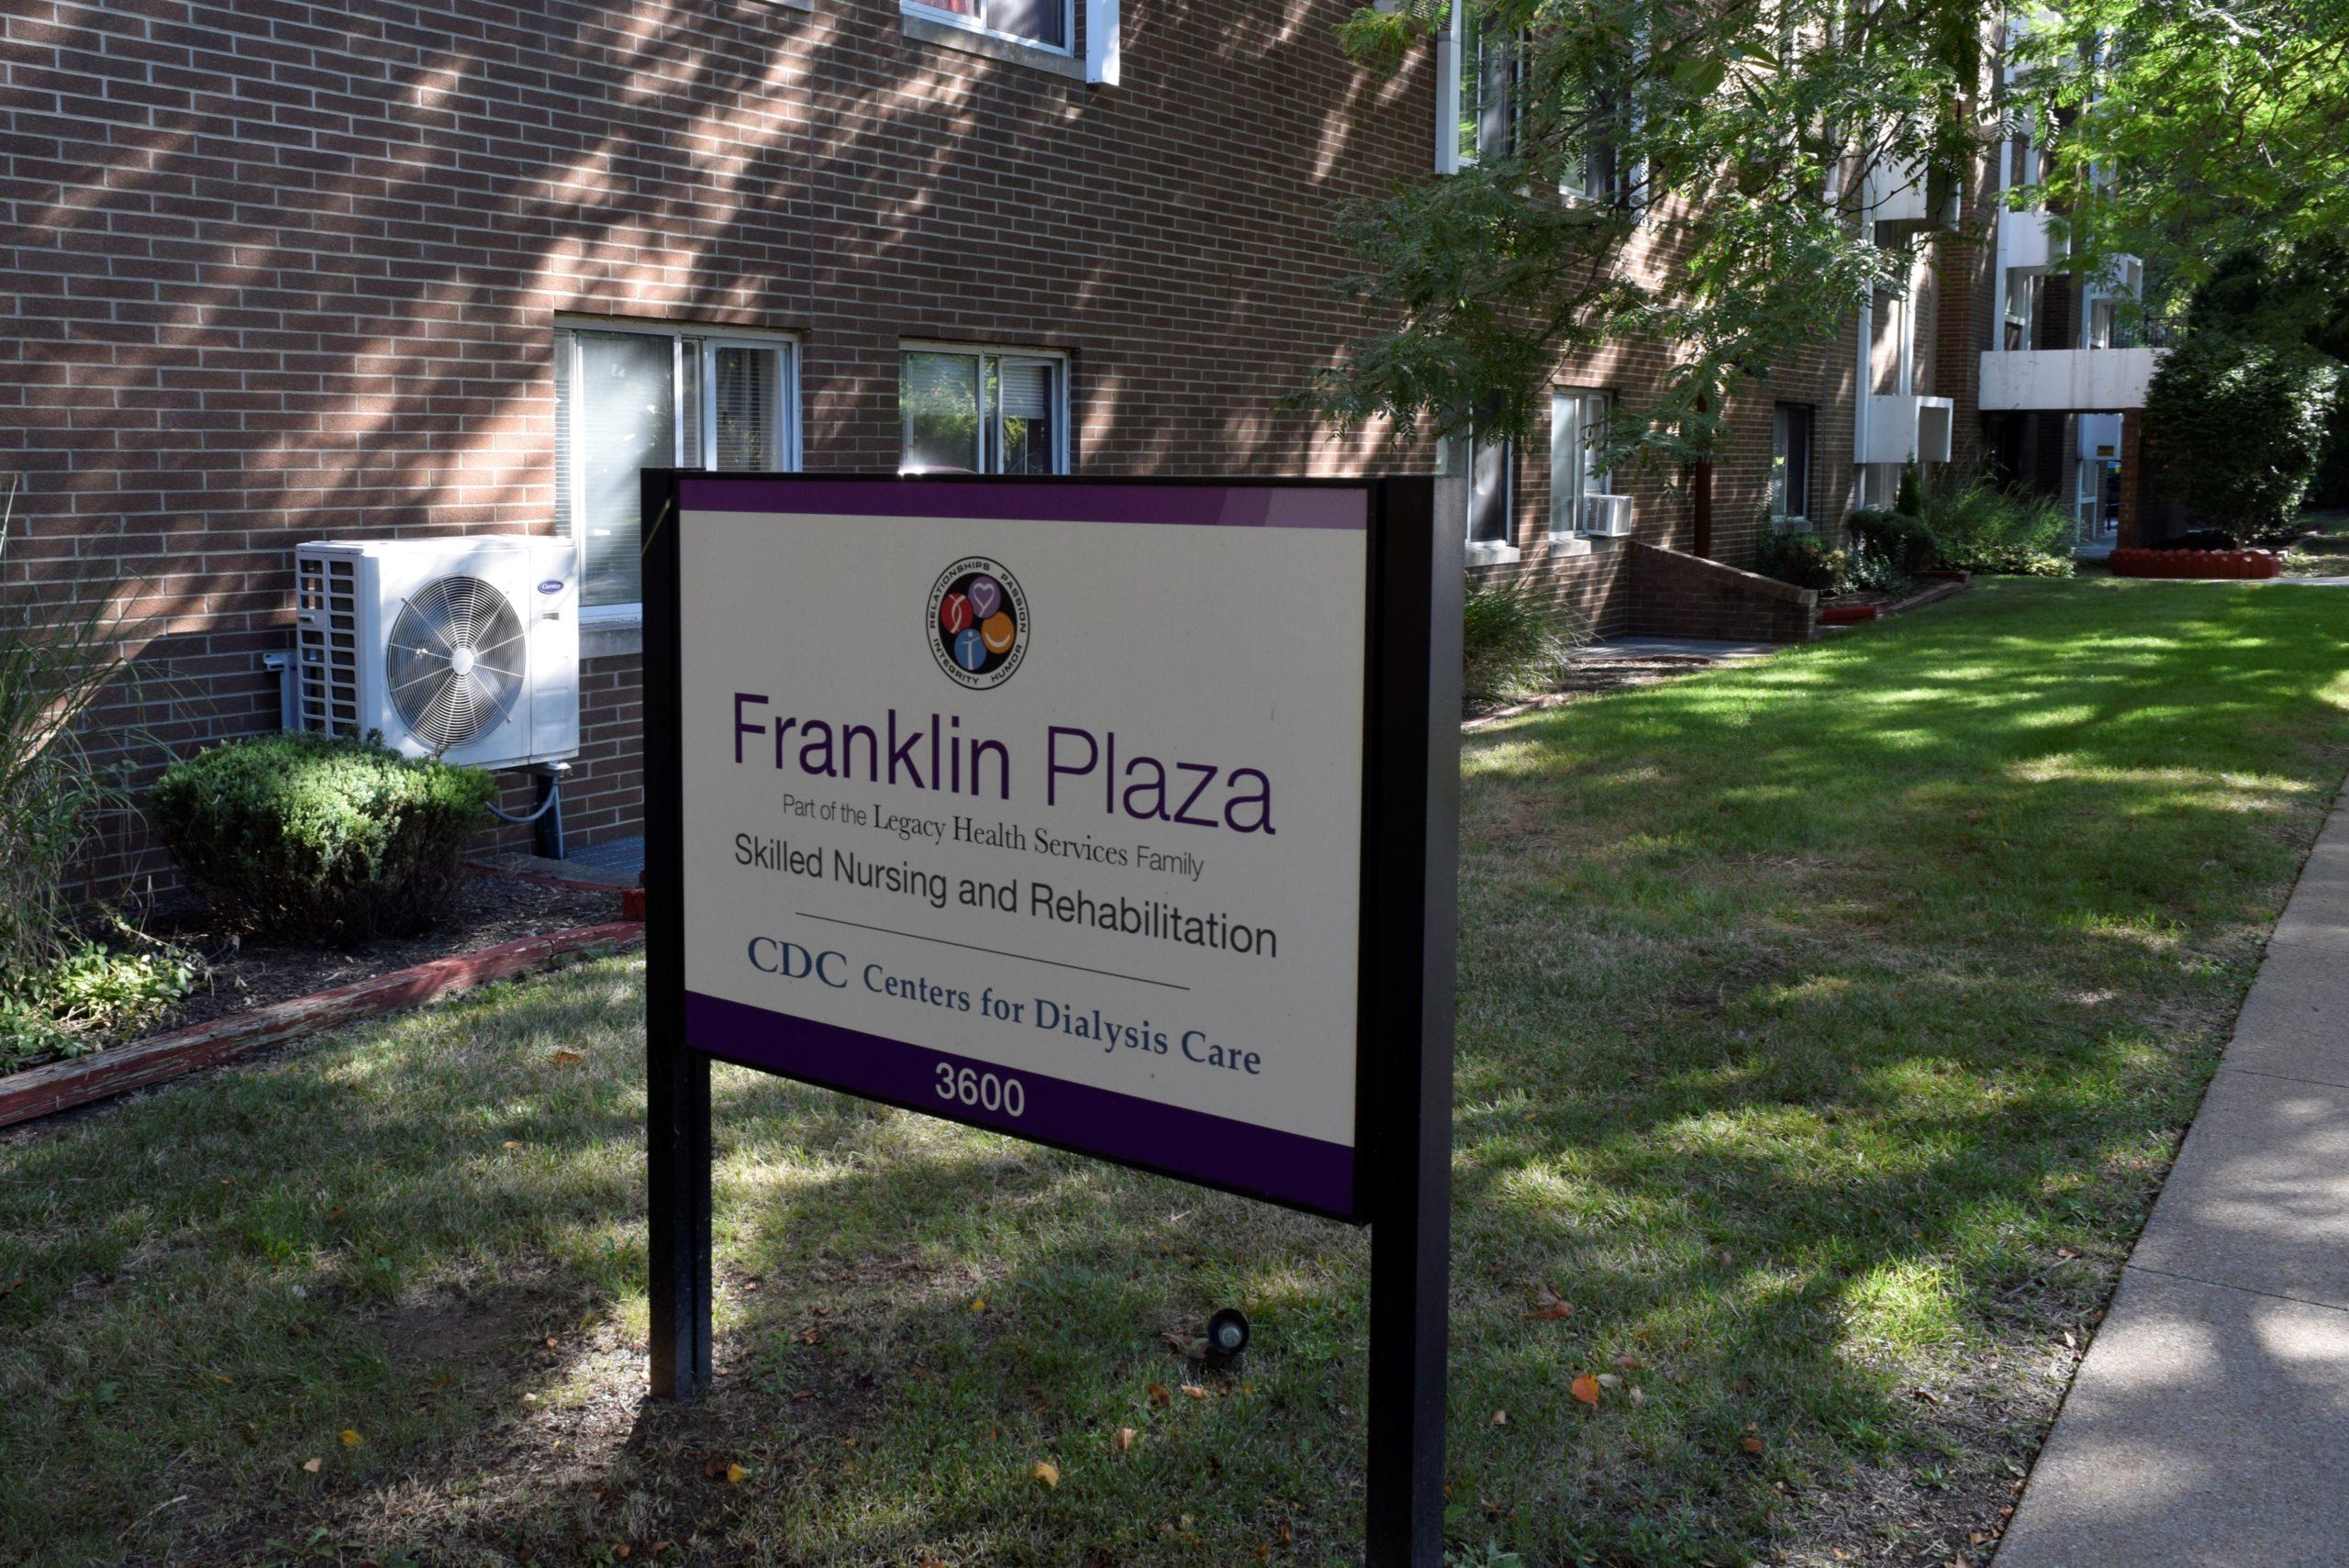 Franklin Plaza Ministry